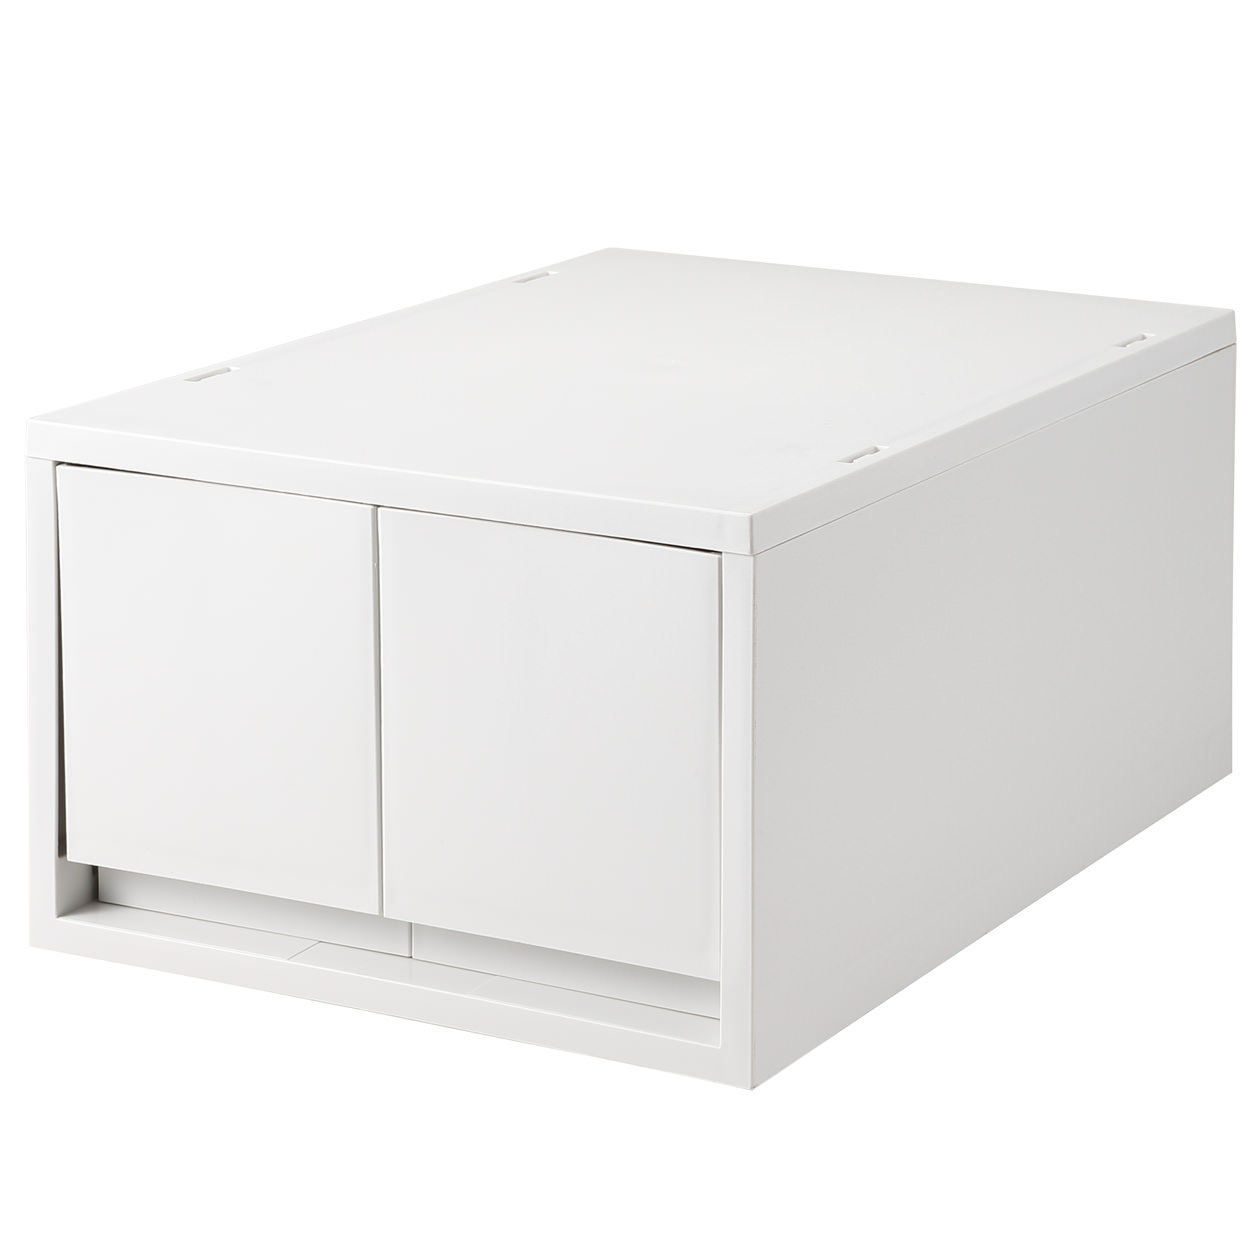 RoomClip商品情報 - ポリプロピレンケース・引出式・深型・2個(仕切付) ホワイトグレー